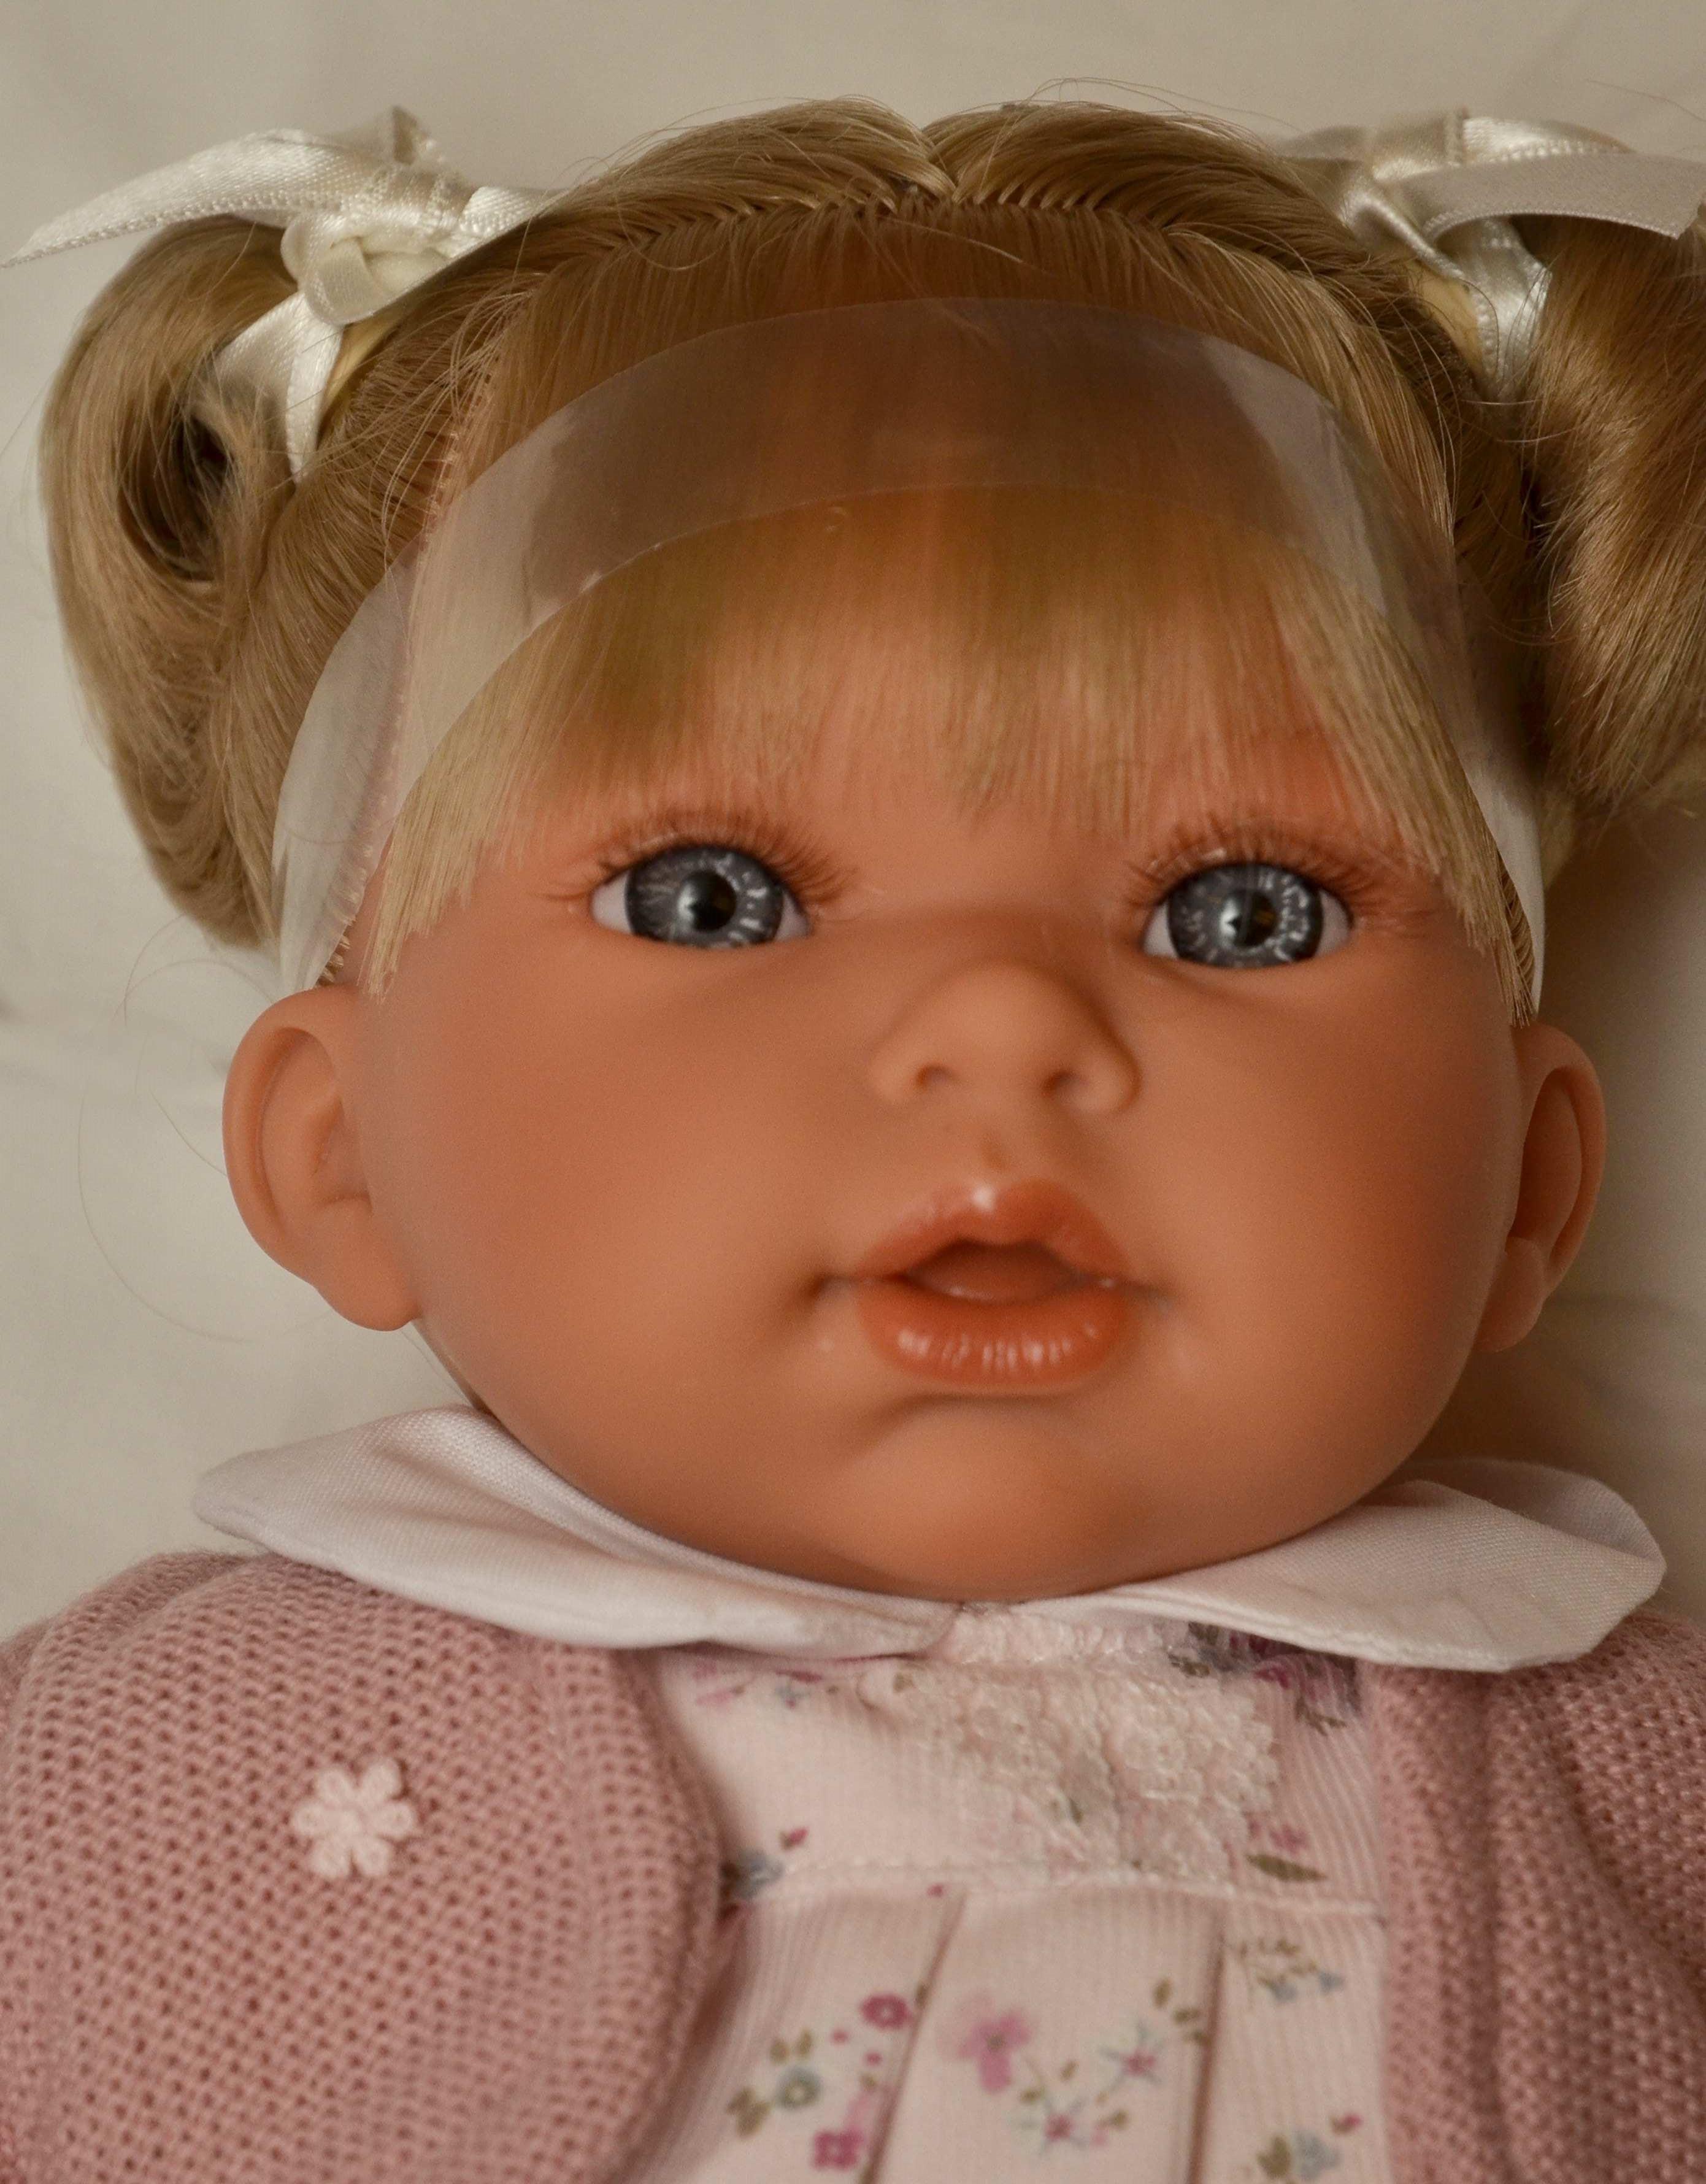 Realistická panenka Antonio Juan - holčička Any Dos Coletitas - světlé vlásky